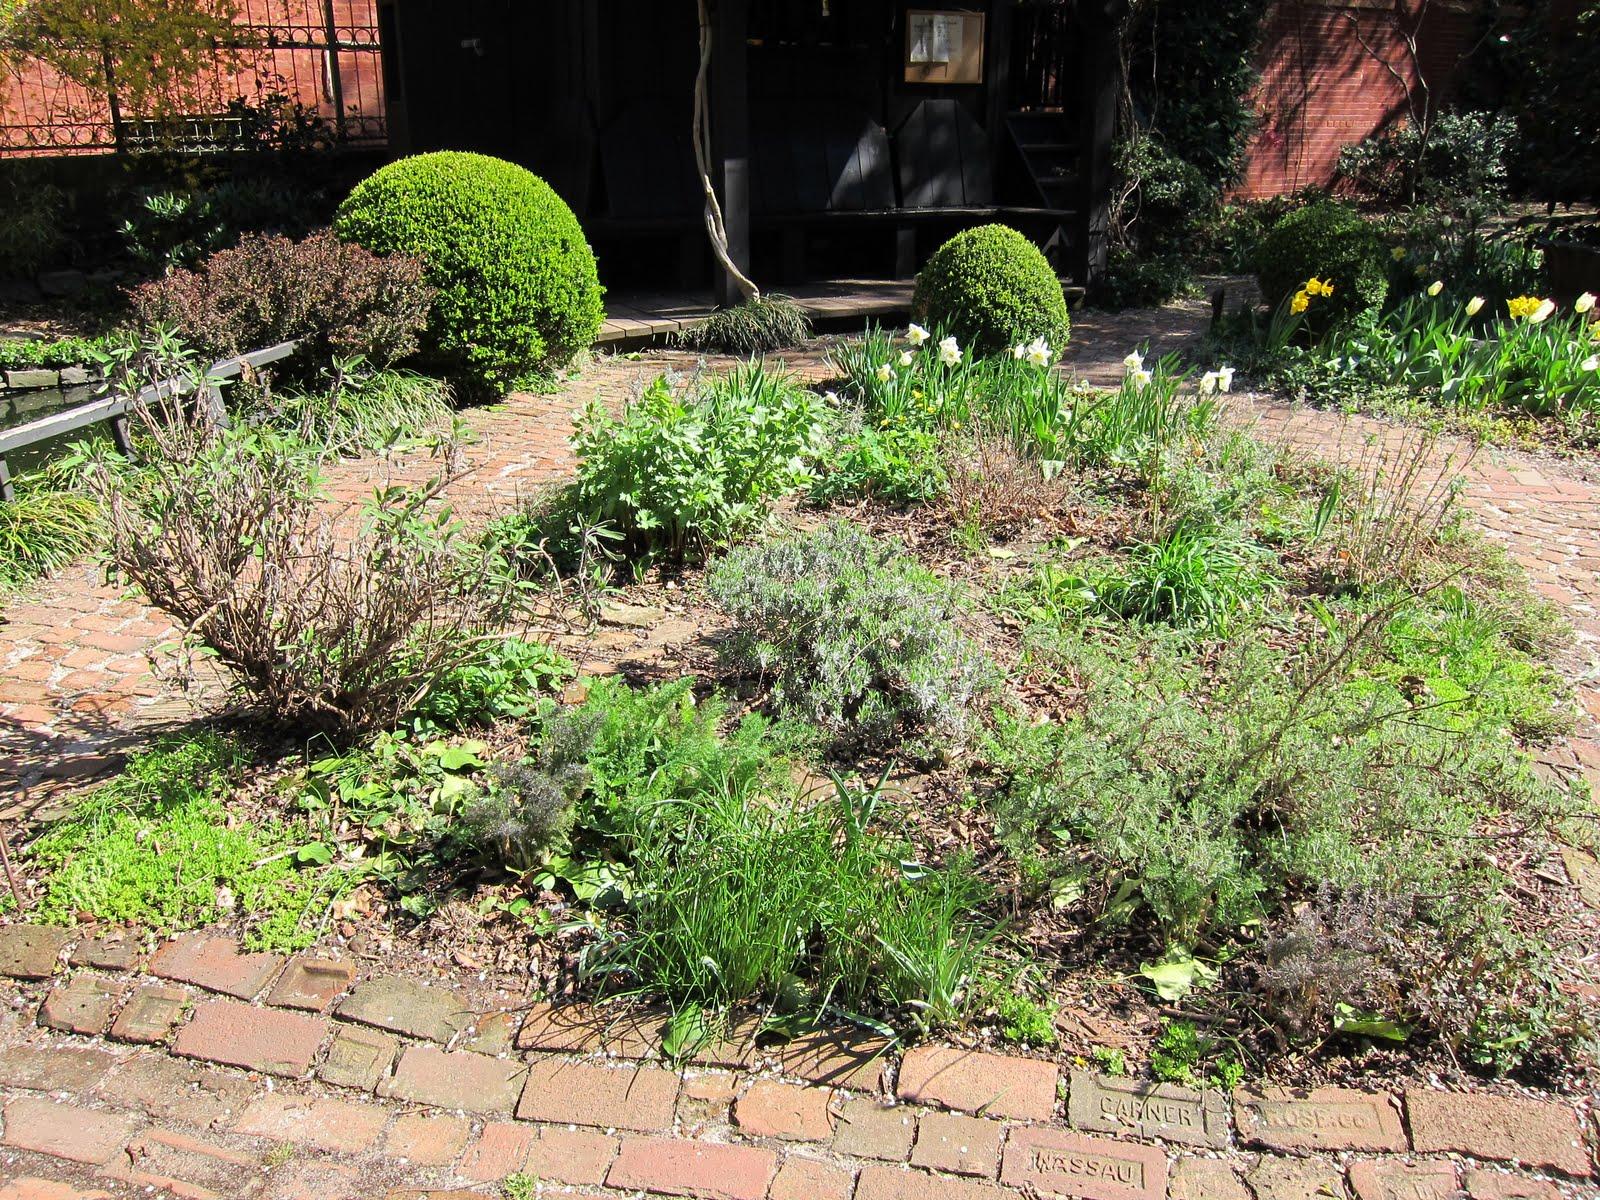 commmunity gardening